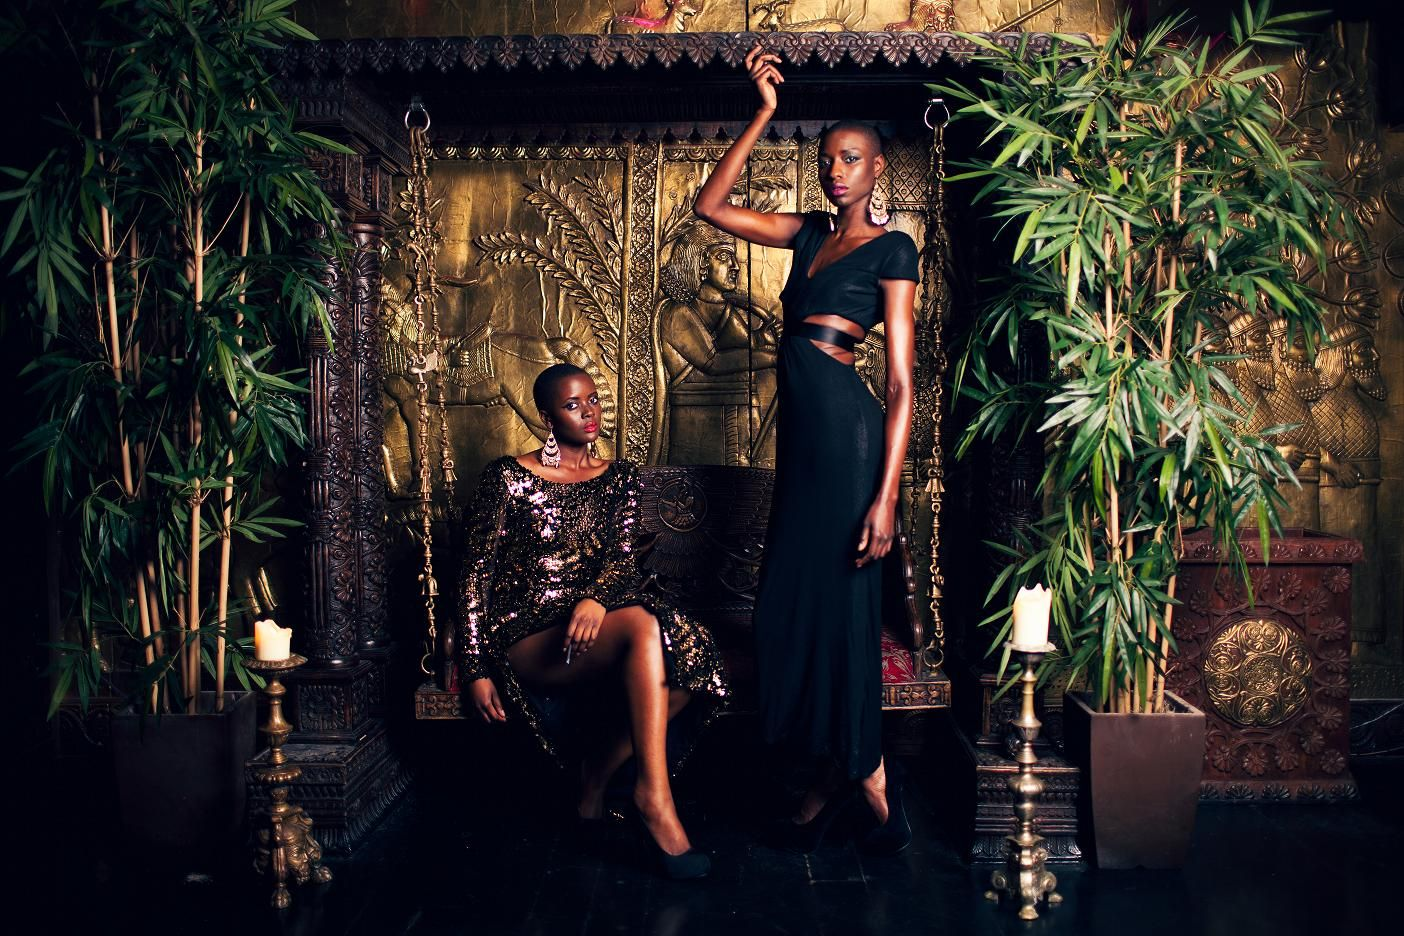 Tina Lobondi Fashion Collection - in pride magazine  http://www.tinalobondi.com/- love it